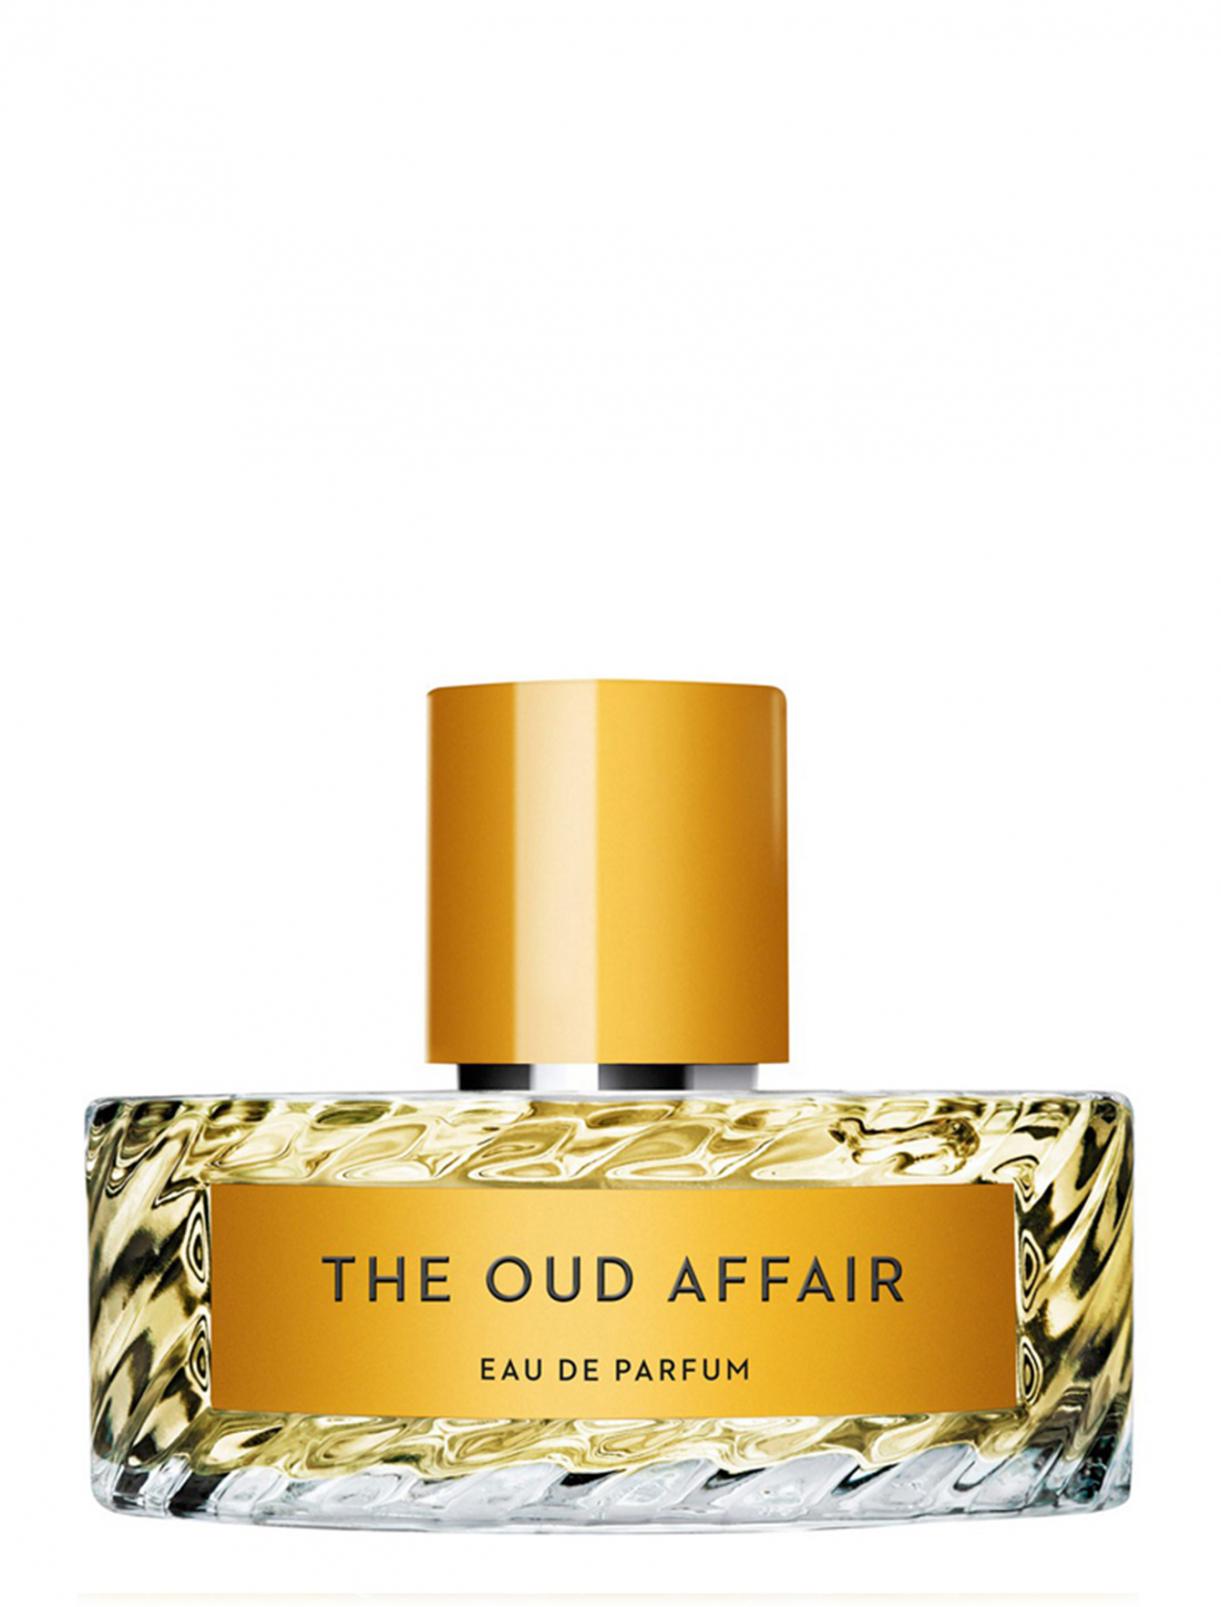 Парфюмерная вода 100 мл The Oud Affair Vilhelm Parfumerie  –  Общий вид